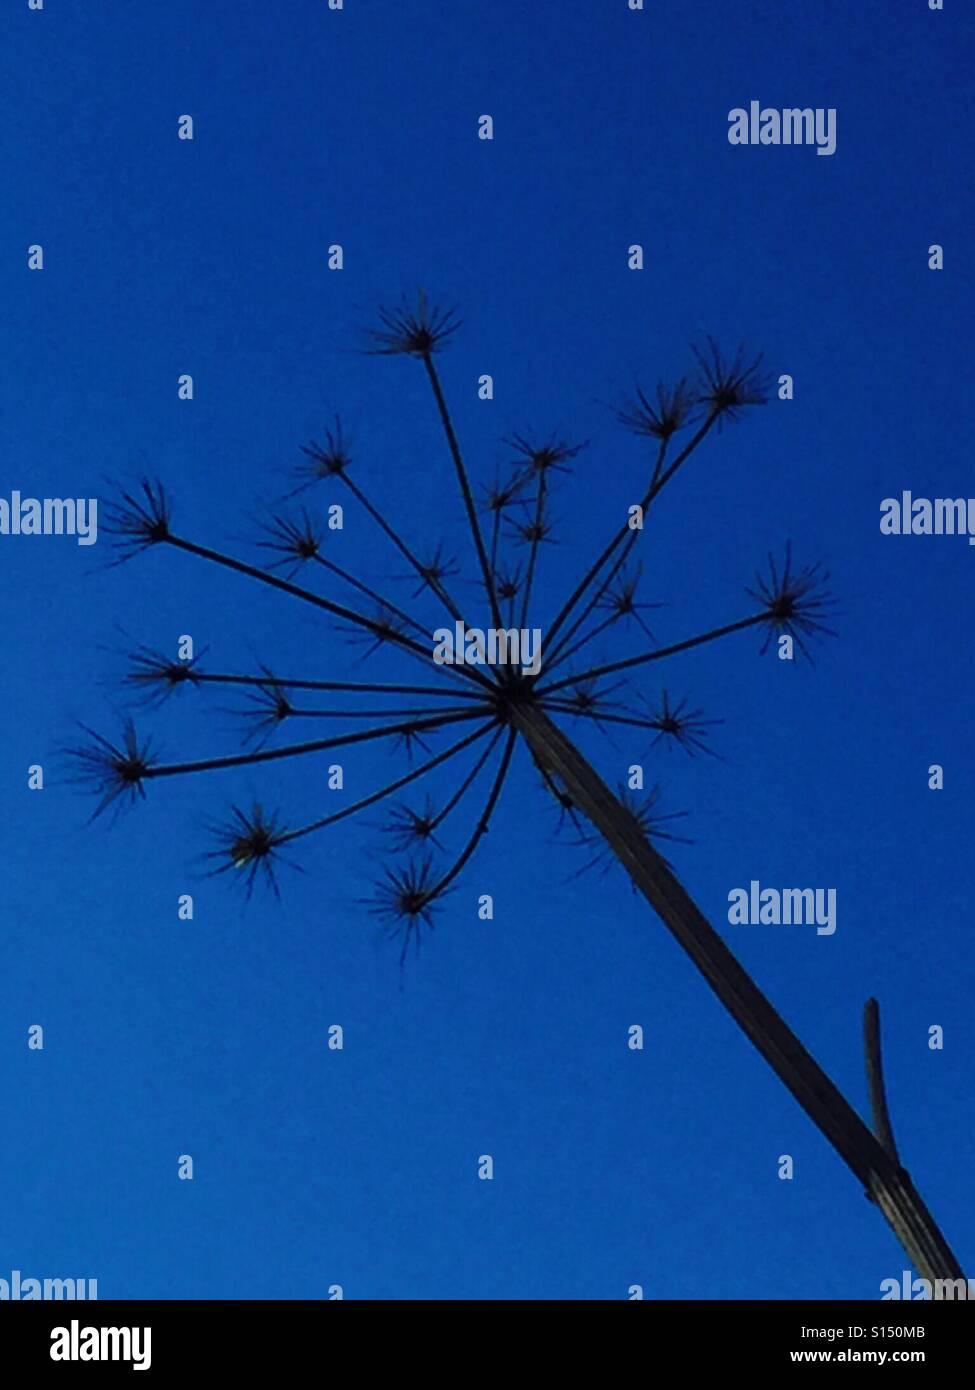 Dried flower against vivid blue sky - Stock Image